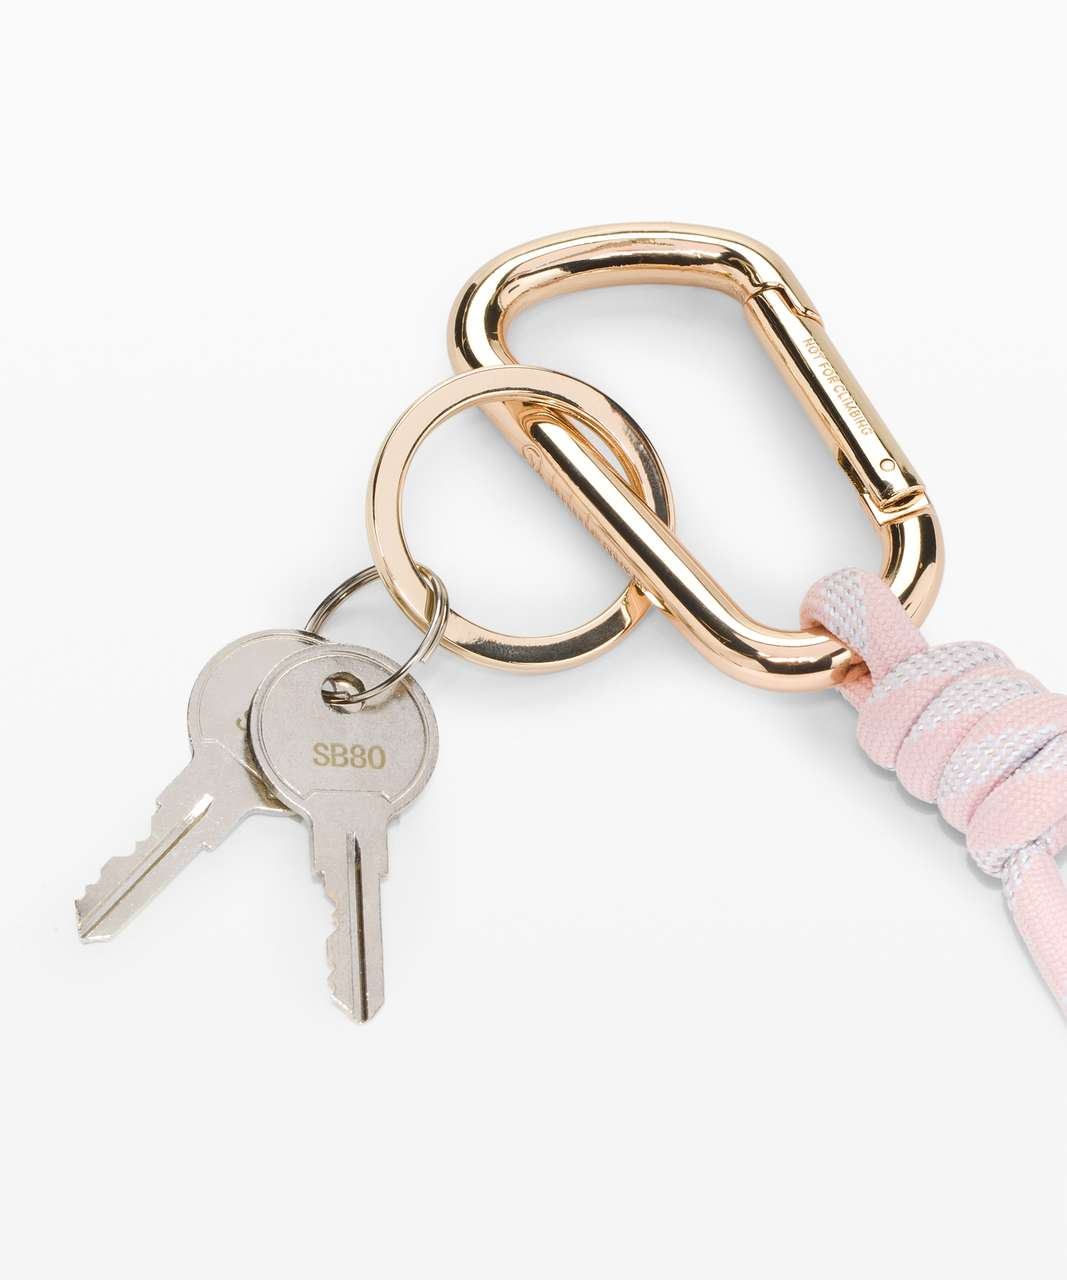 Lululemon You Hold The Keychain - Misty Pink